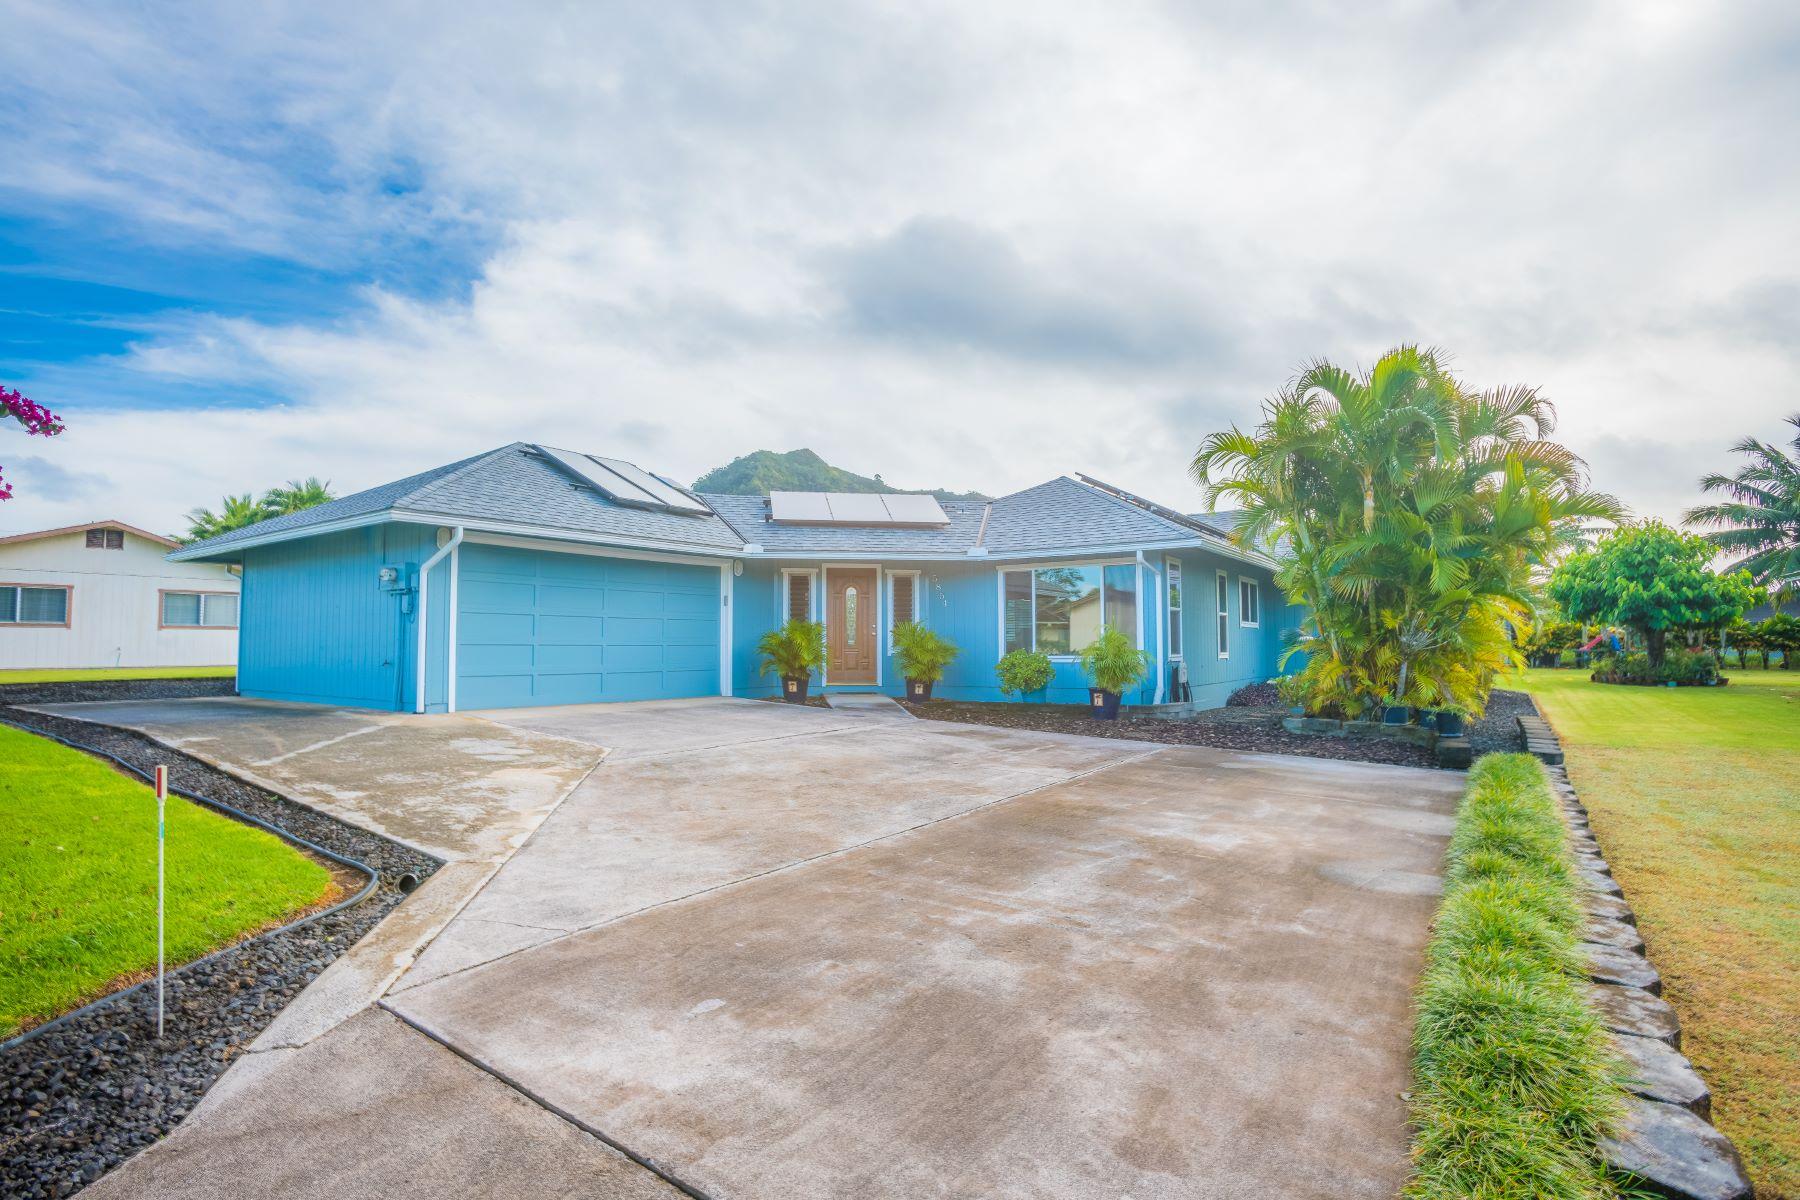 Single Family Home for Sale at 5854 Haaheo Pl. 5854 Haaheo Pl. Kapaa, Hawaii 96746 United States